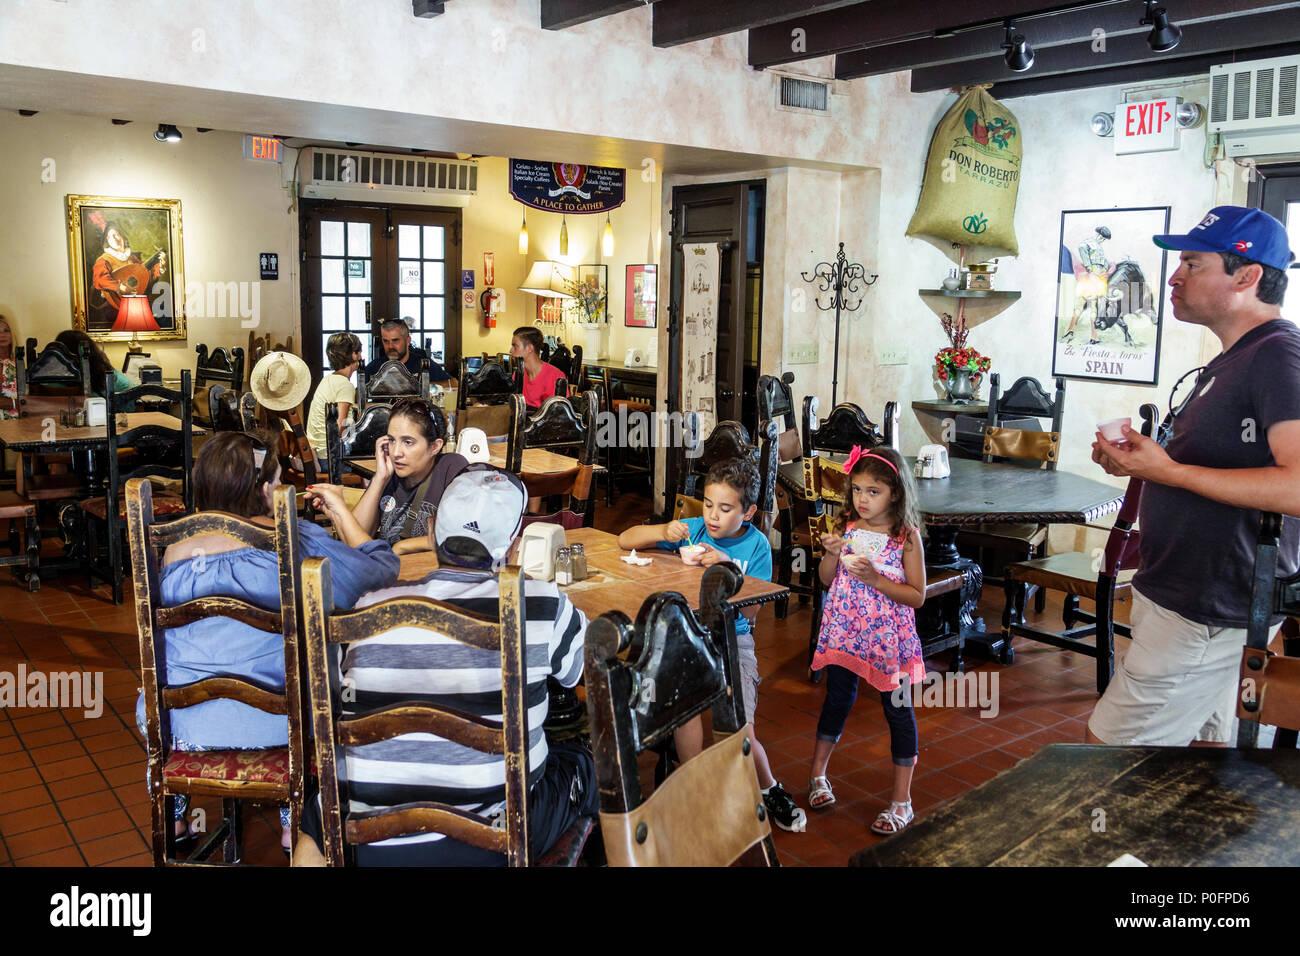 Cafe De Hidalgo St George St